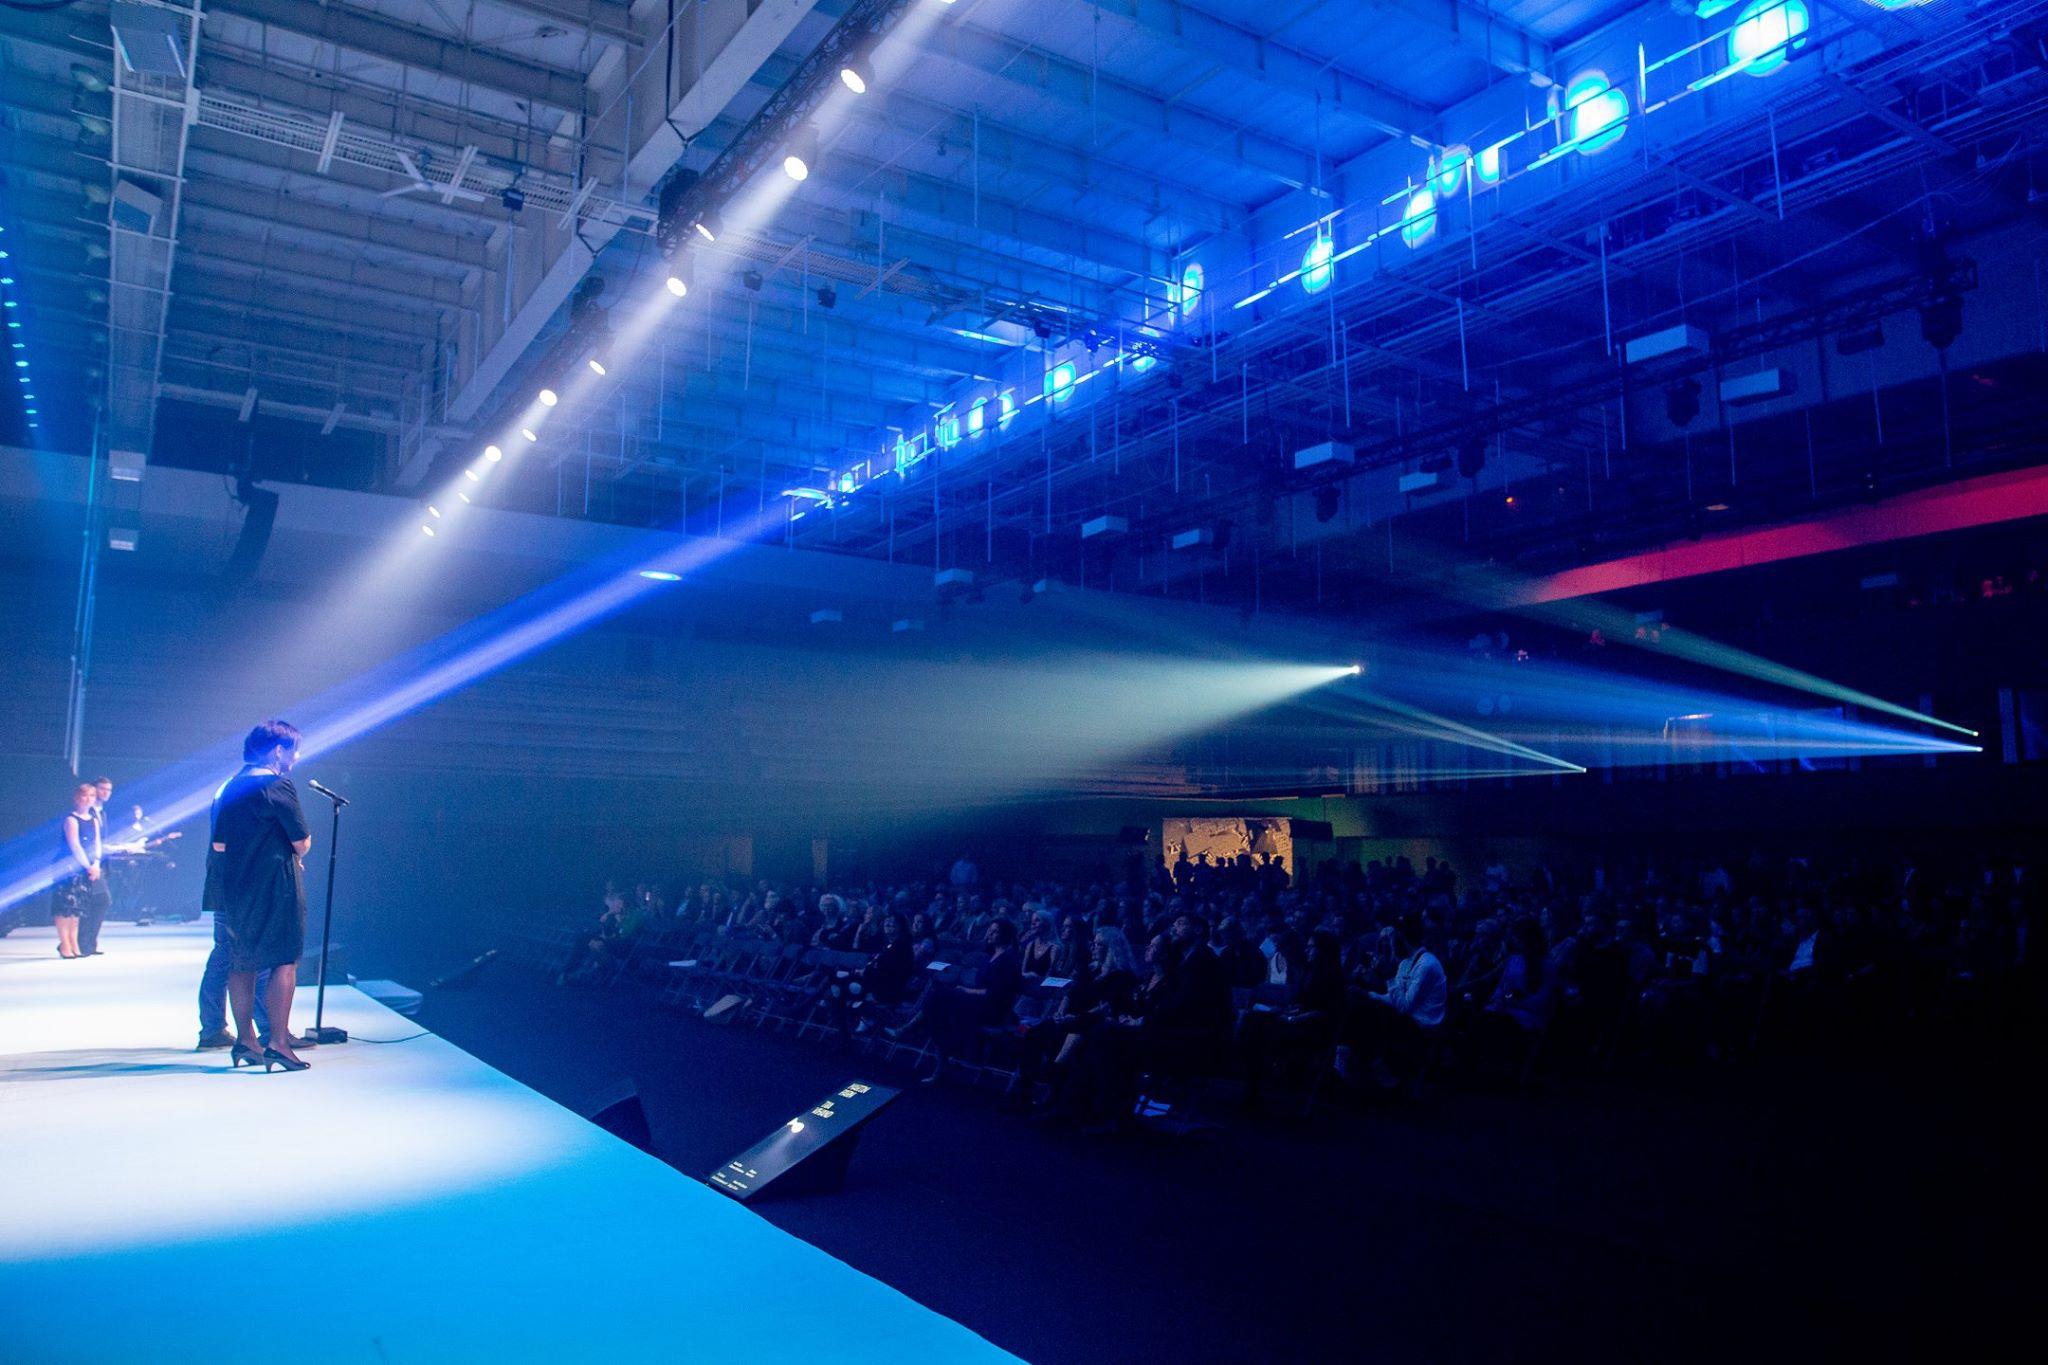 Estonian Design Awards Piibe Tomp